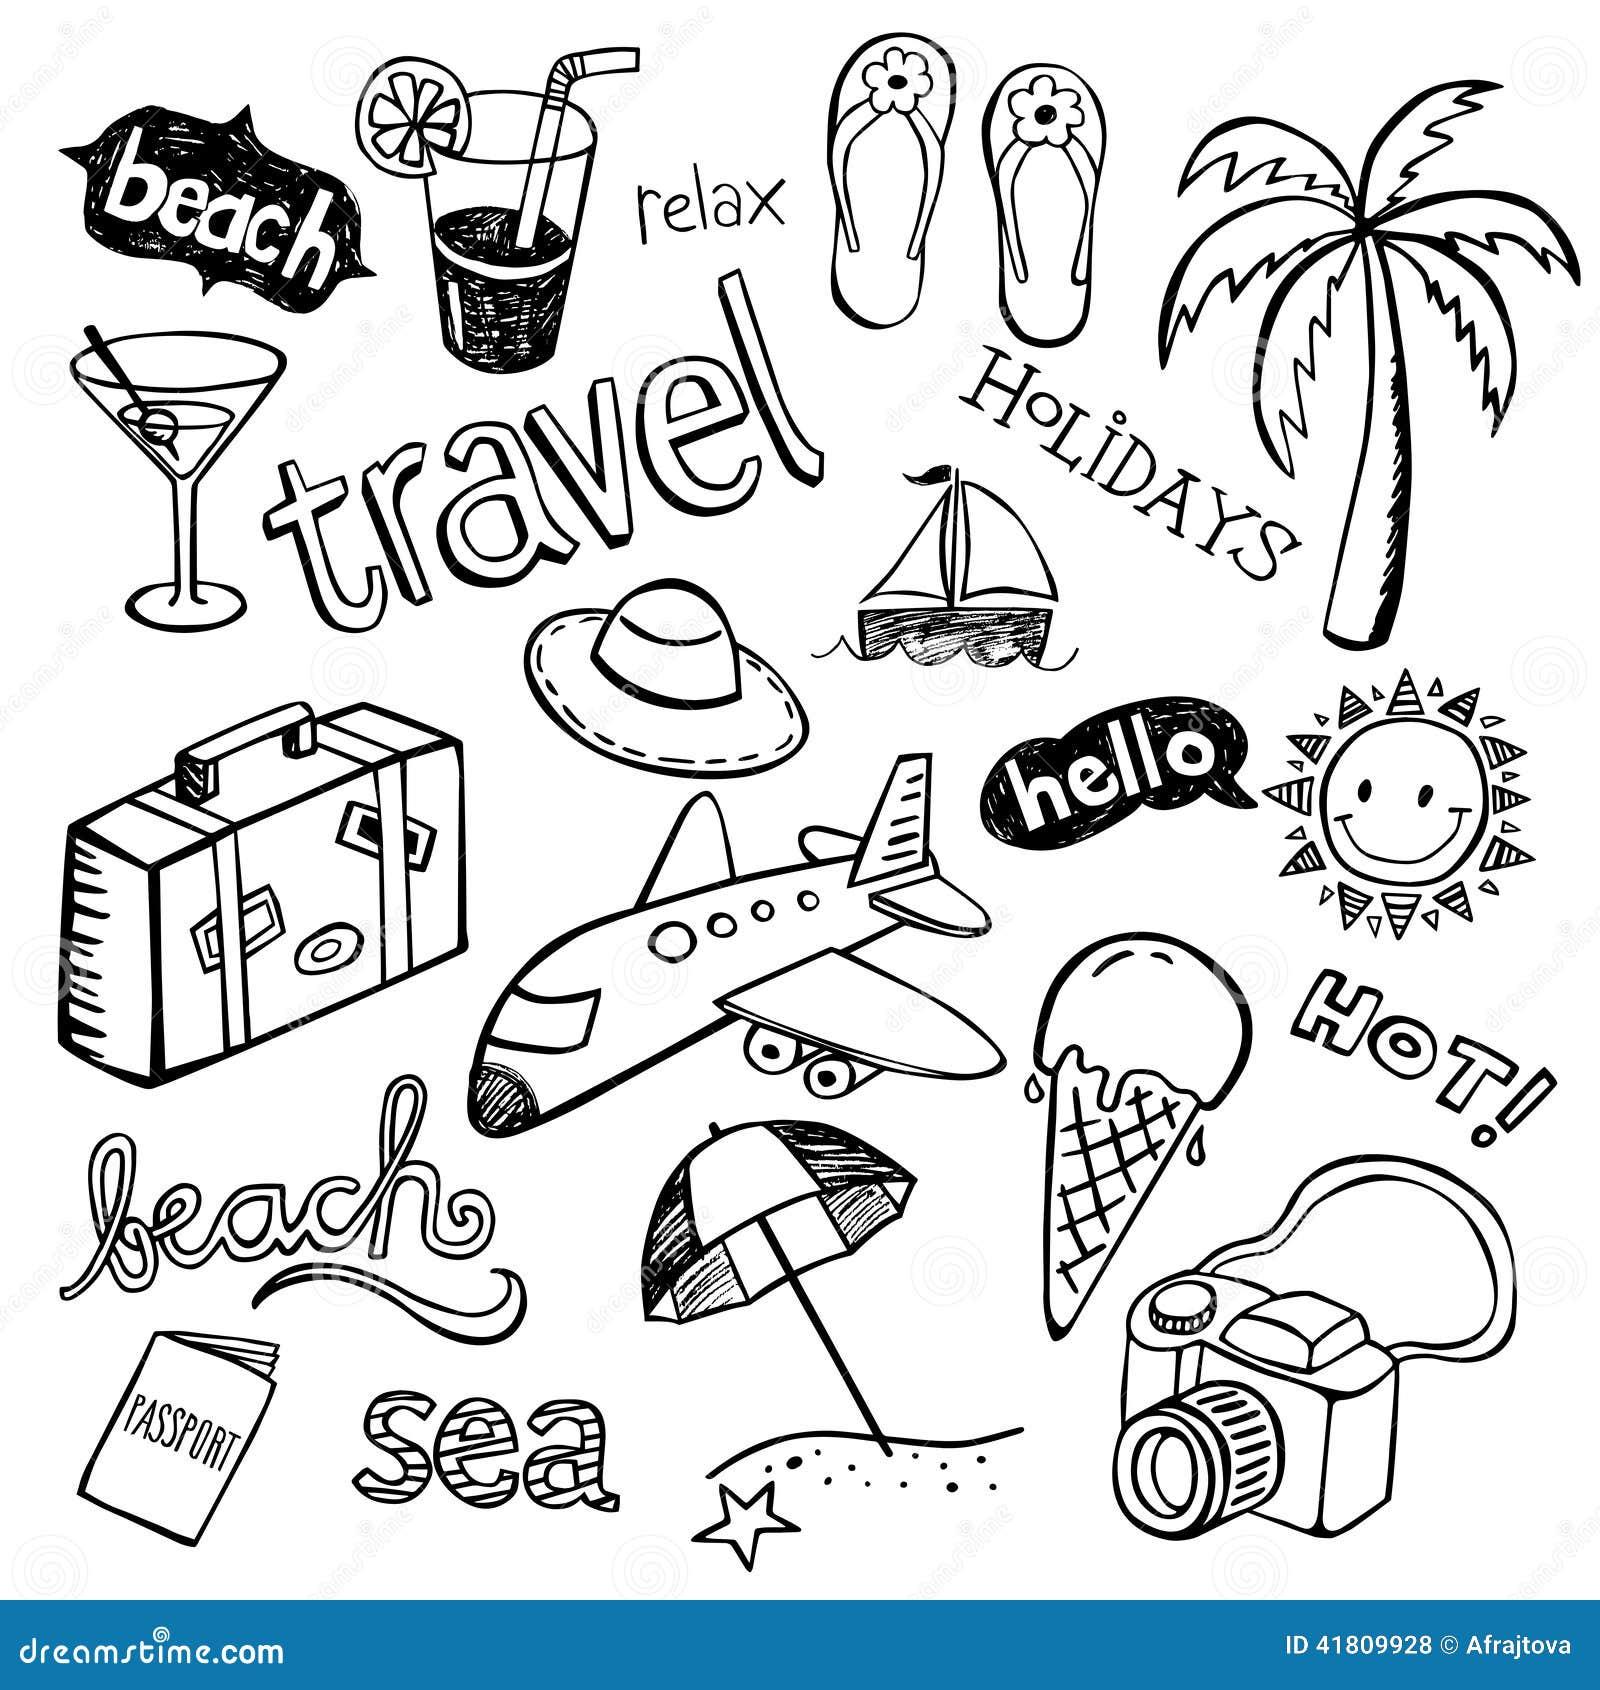 Beach Doodles Stock Vector. Illustration Of Flops, Flight